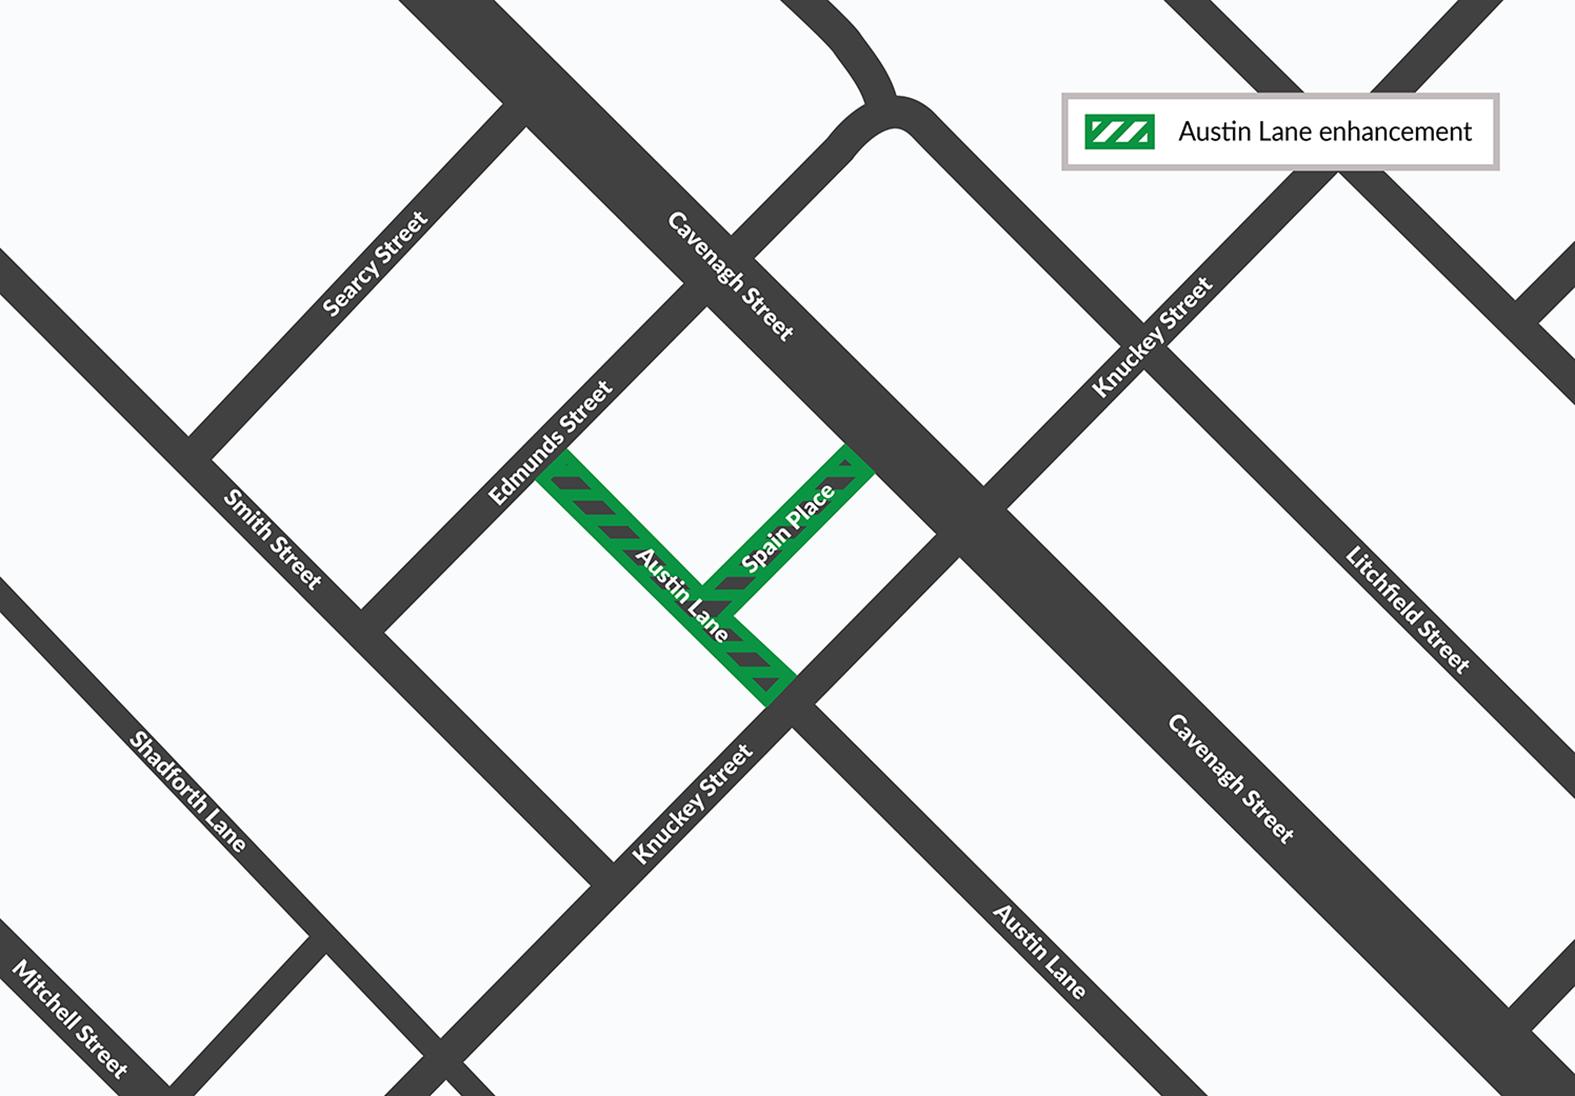 Austin Lane enhancement map